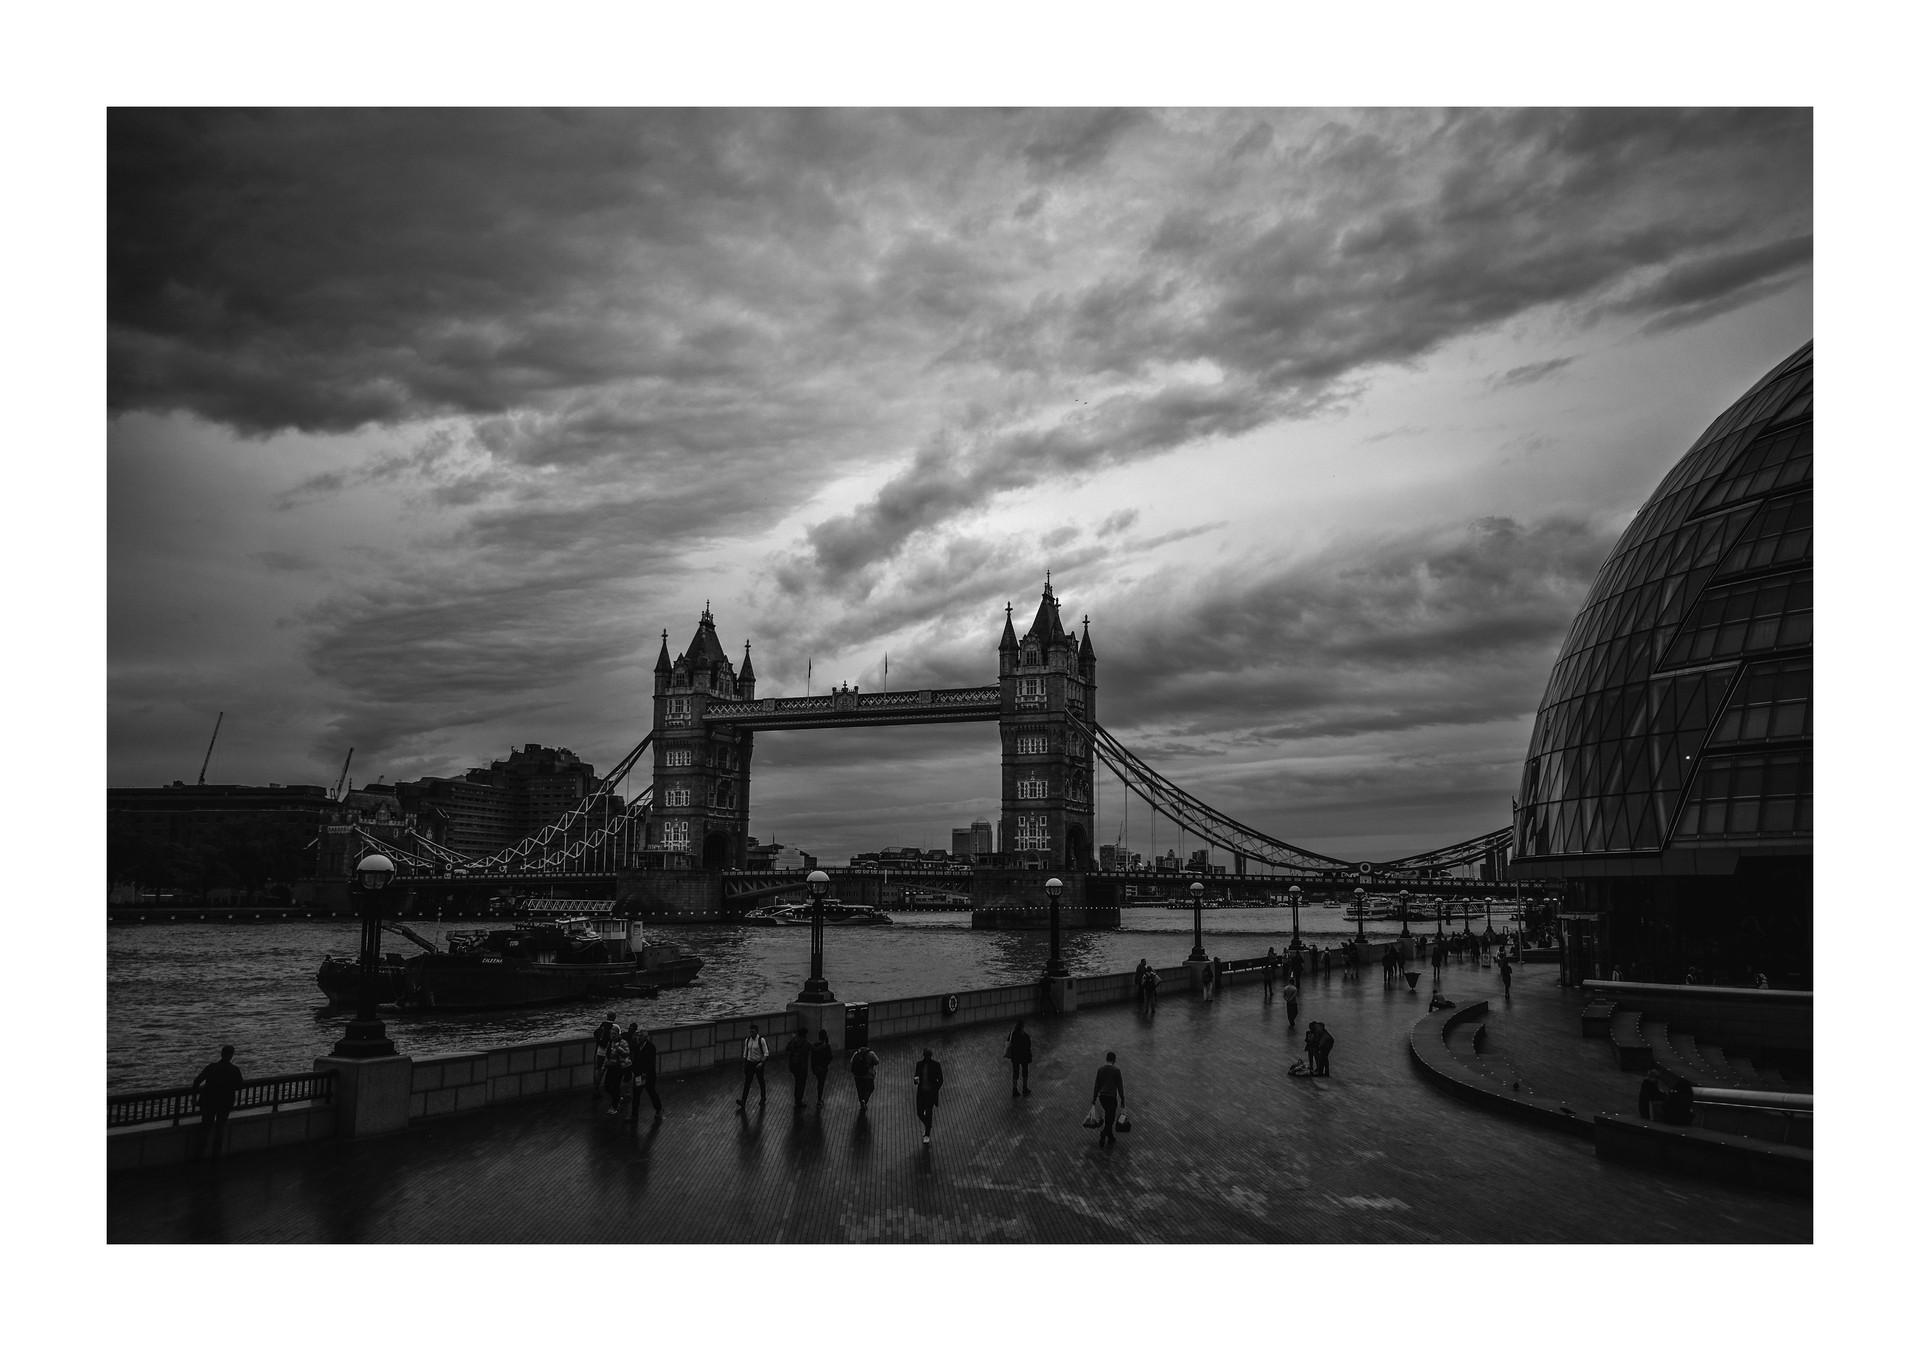 Tower Bridge - London, 2018